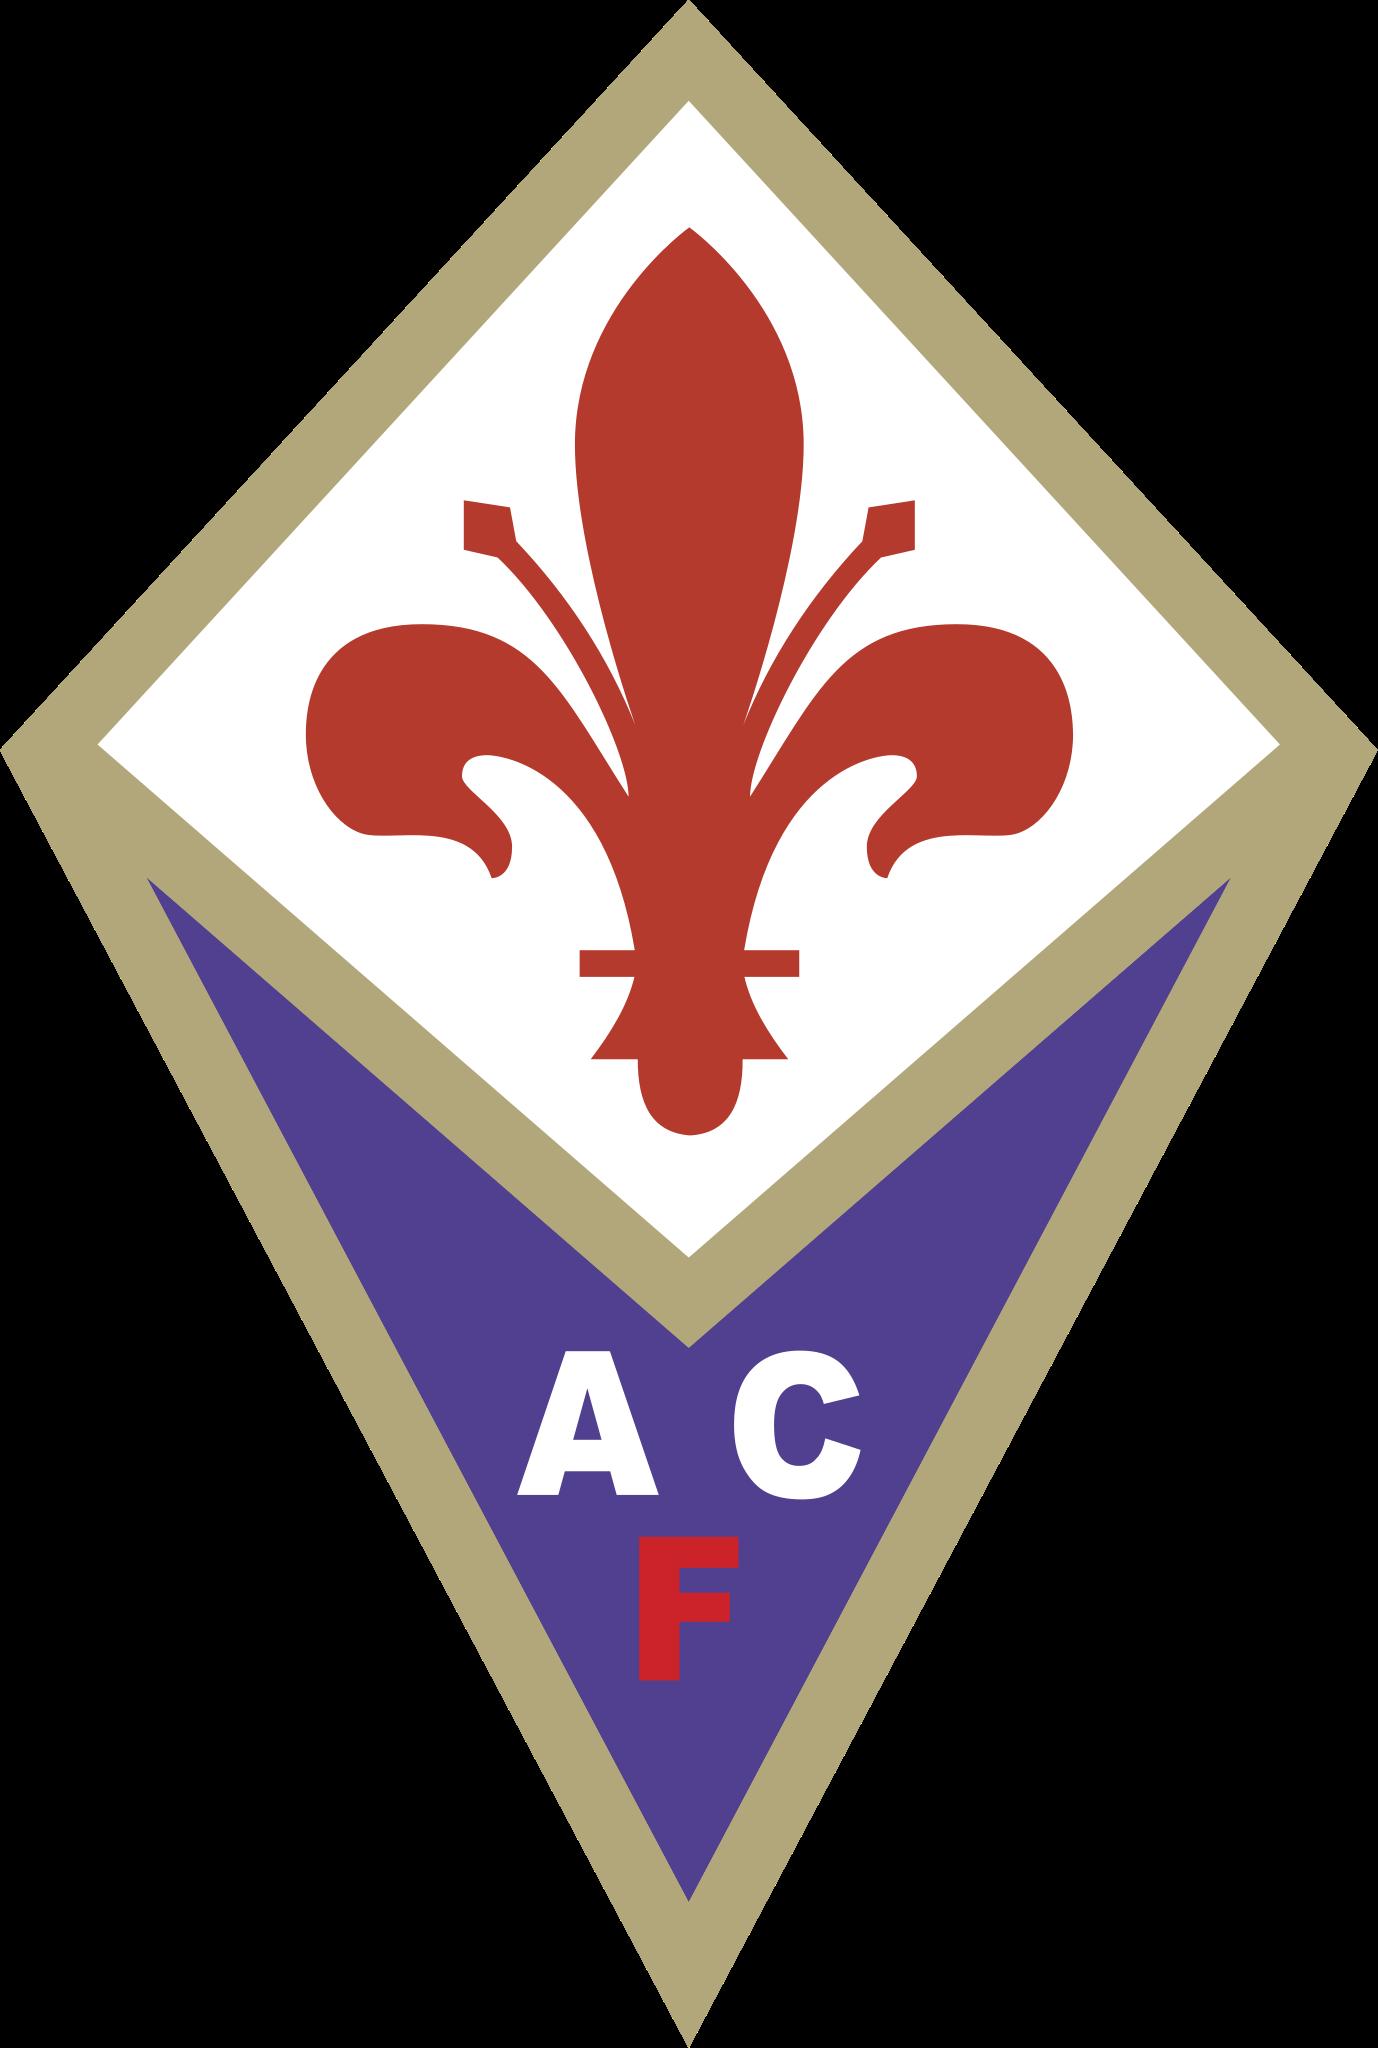 Stemma Ufficiale ACF Fiorentina